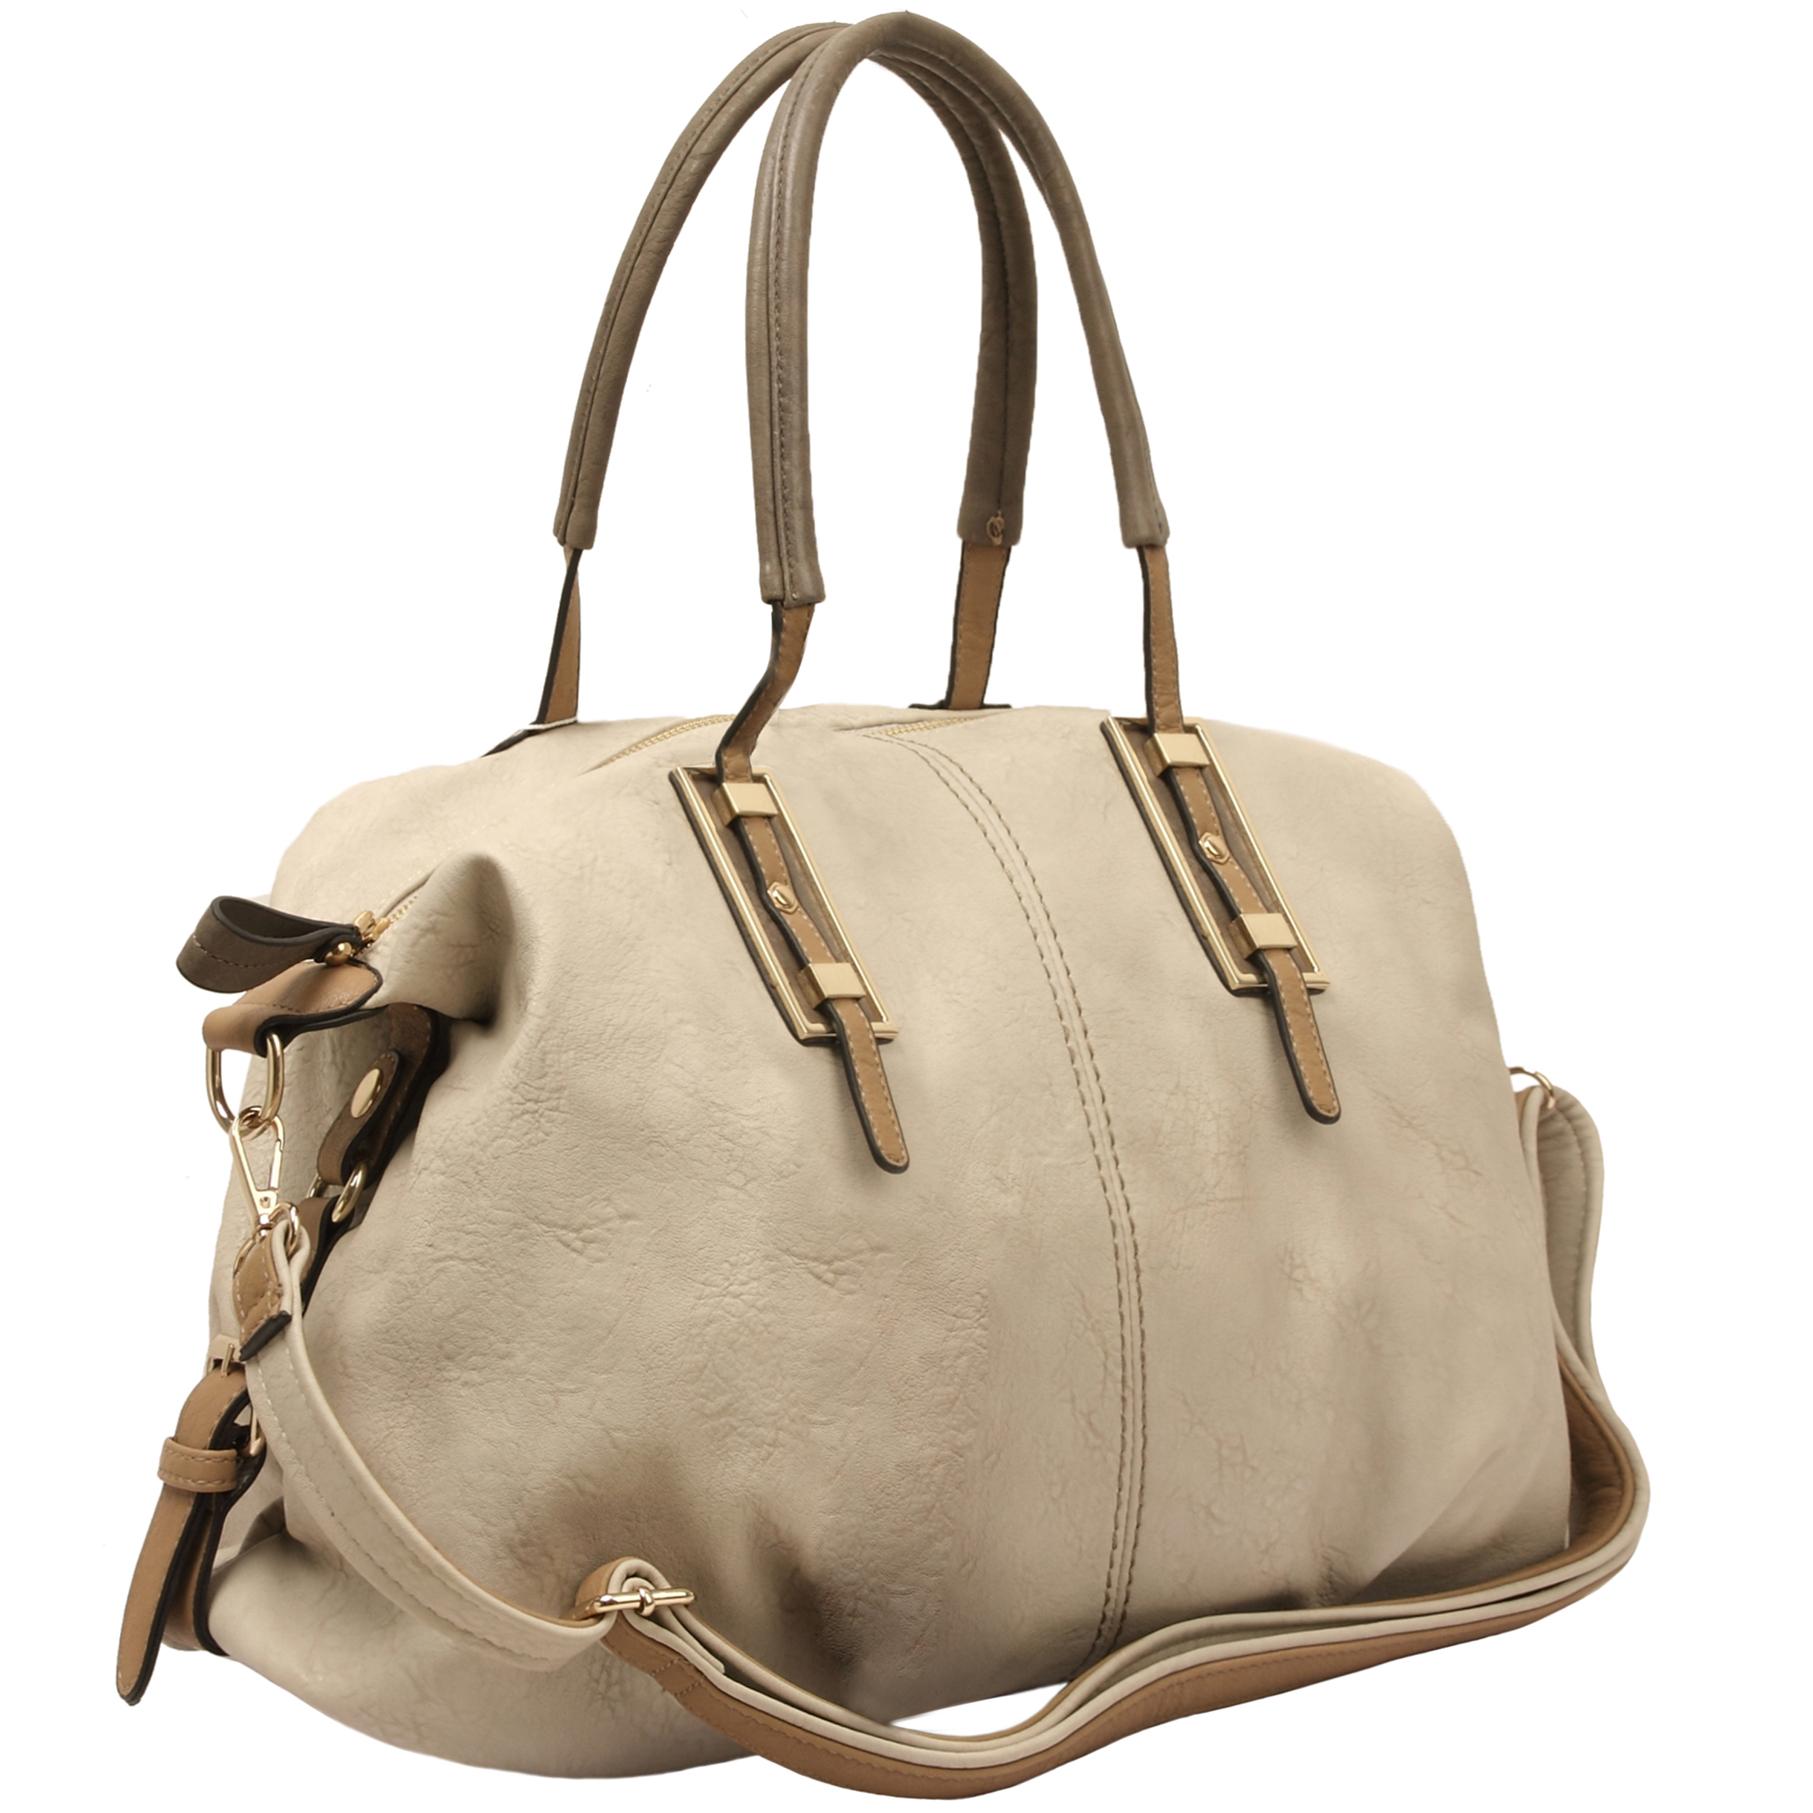 ACACIA Grey Large Everyday Shopper Hobo Handbag main